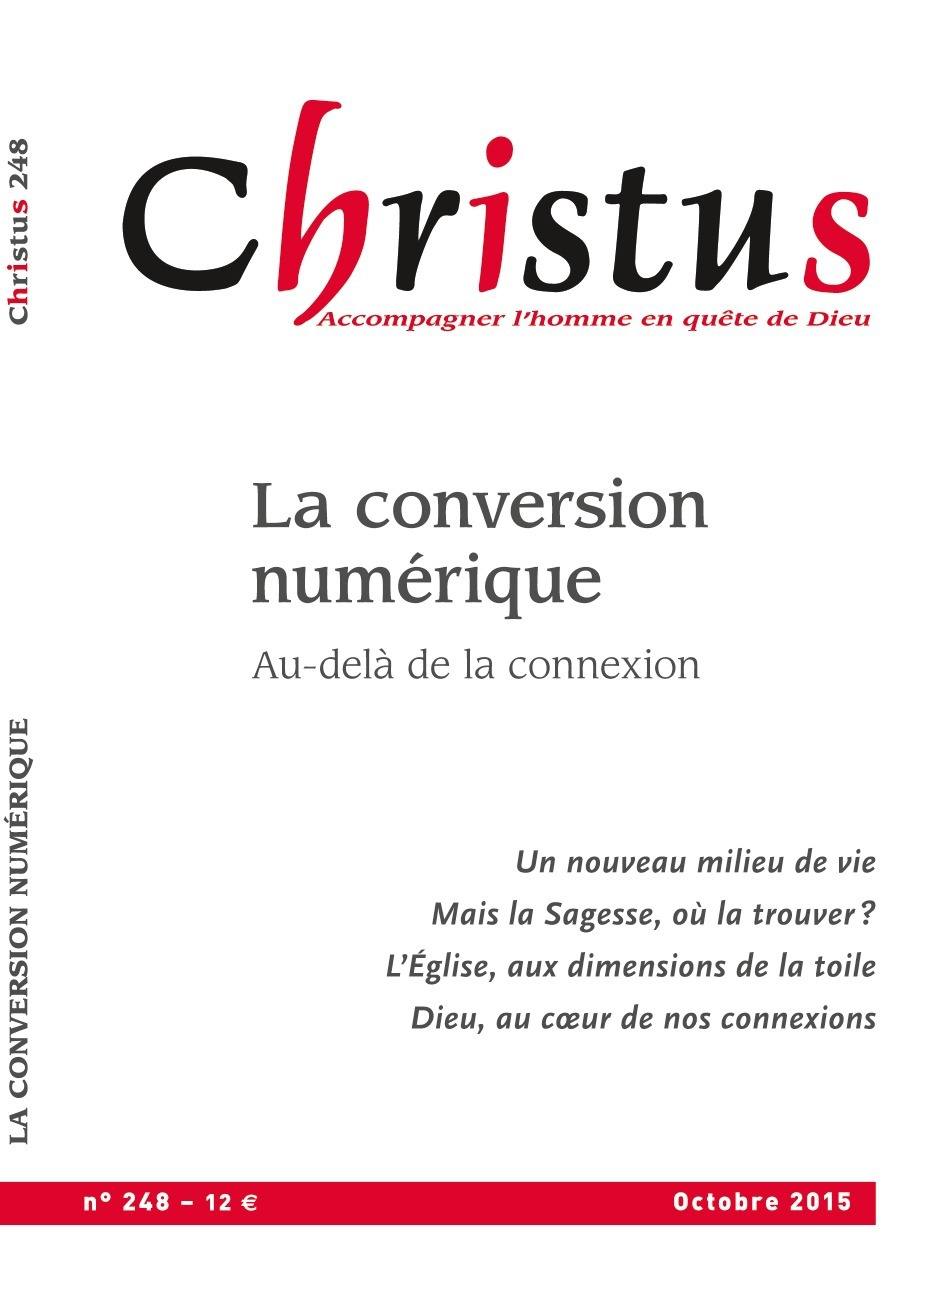 Christus Octobre 2015 - N°225